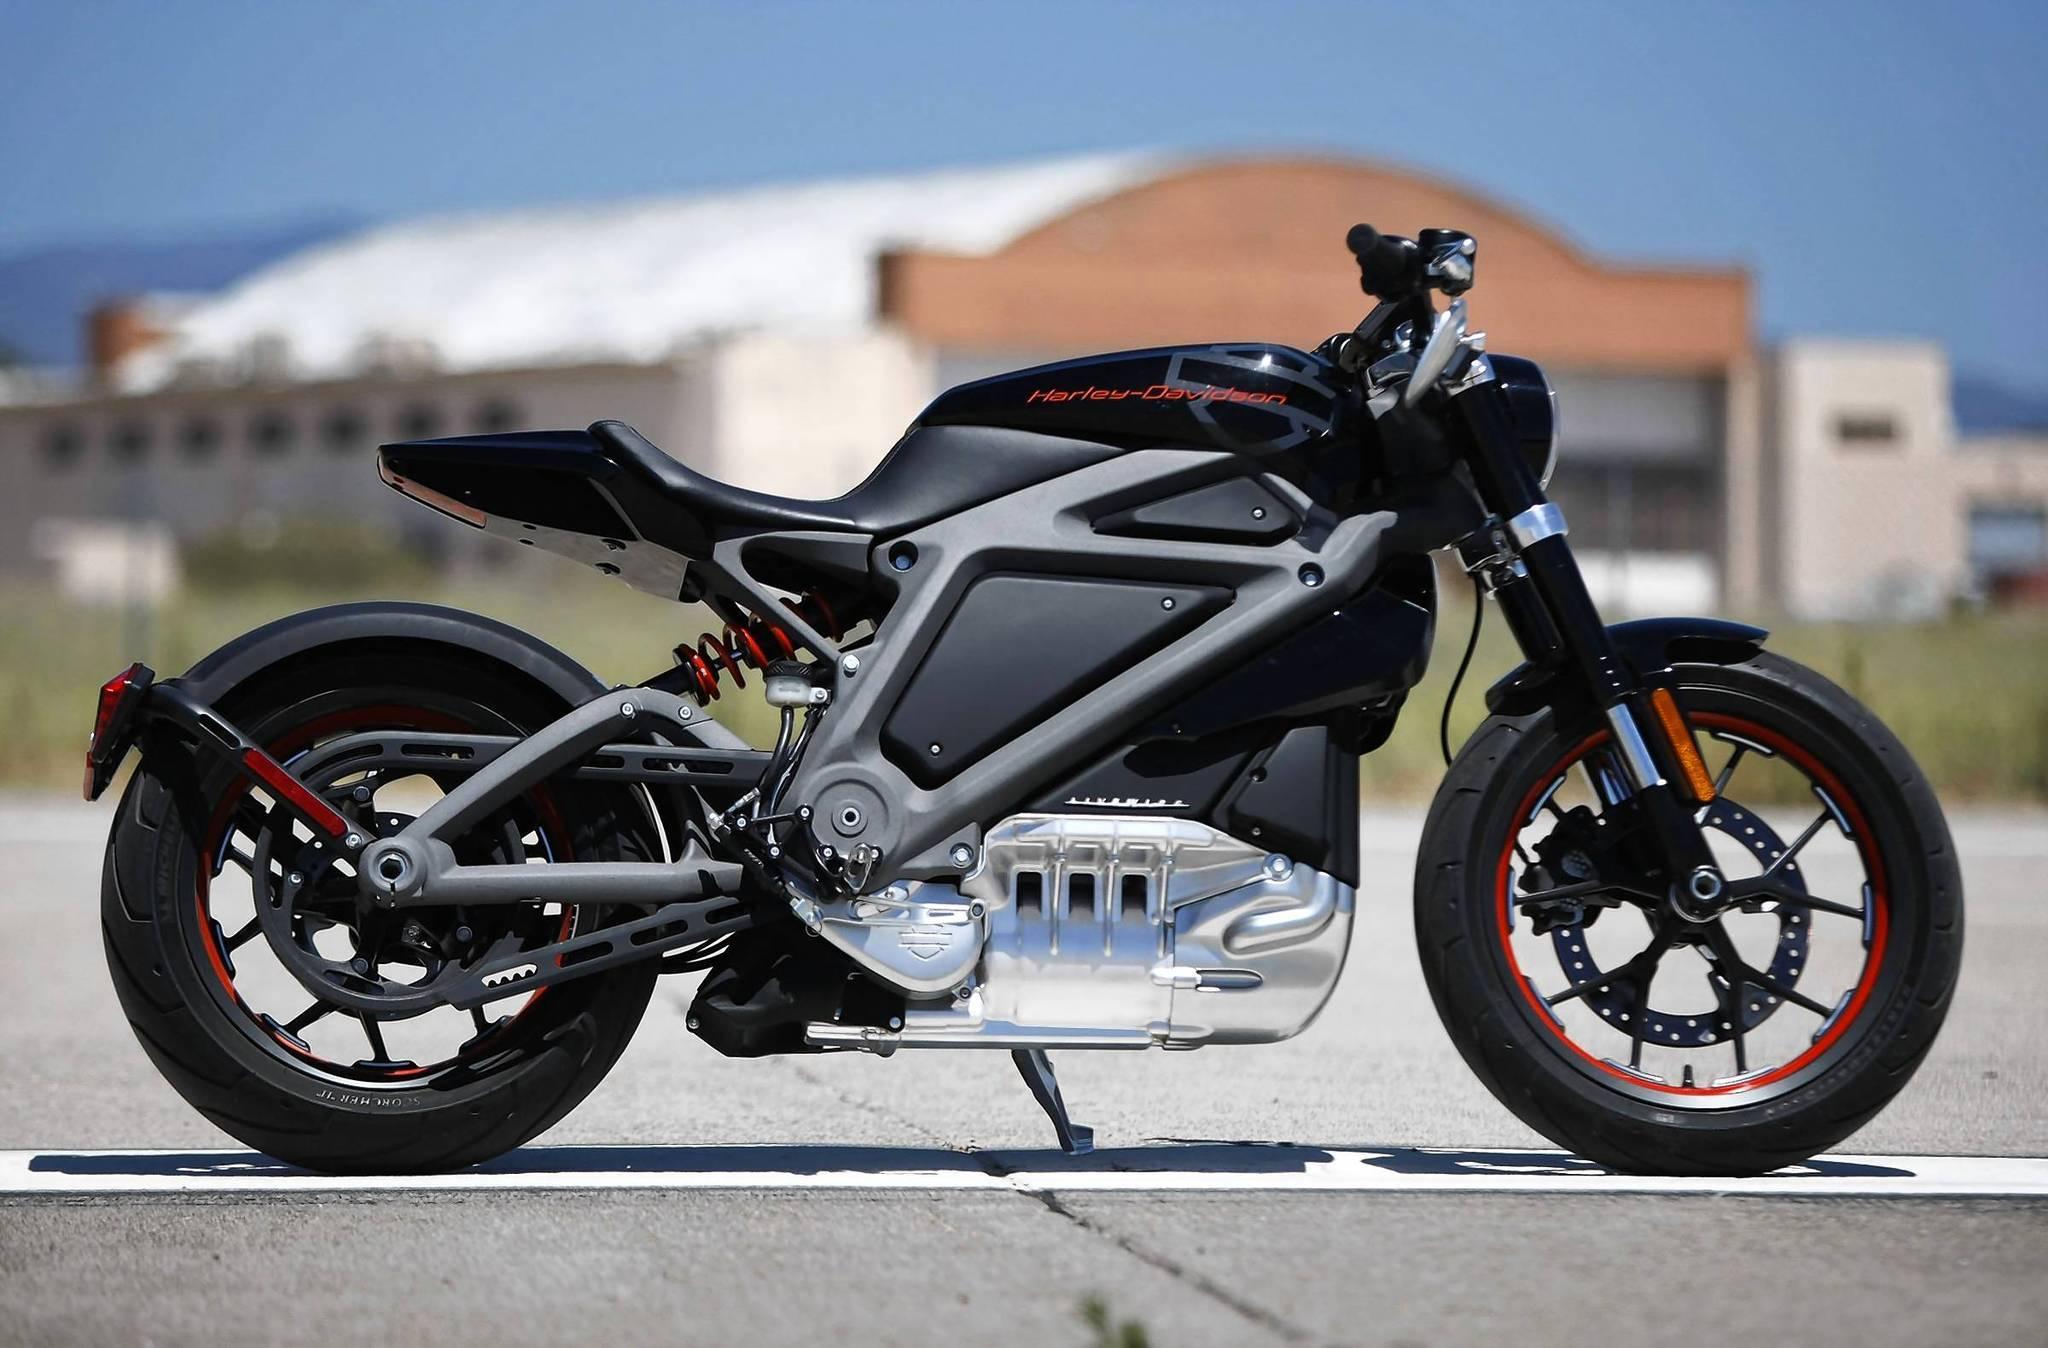 Harley Davidson Bringing Flat Track Racing To X Games La Times